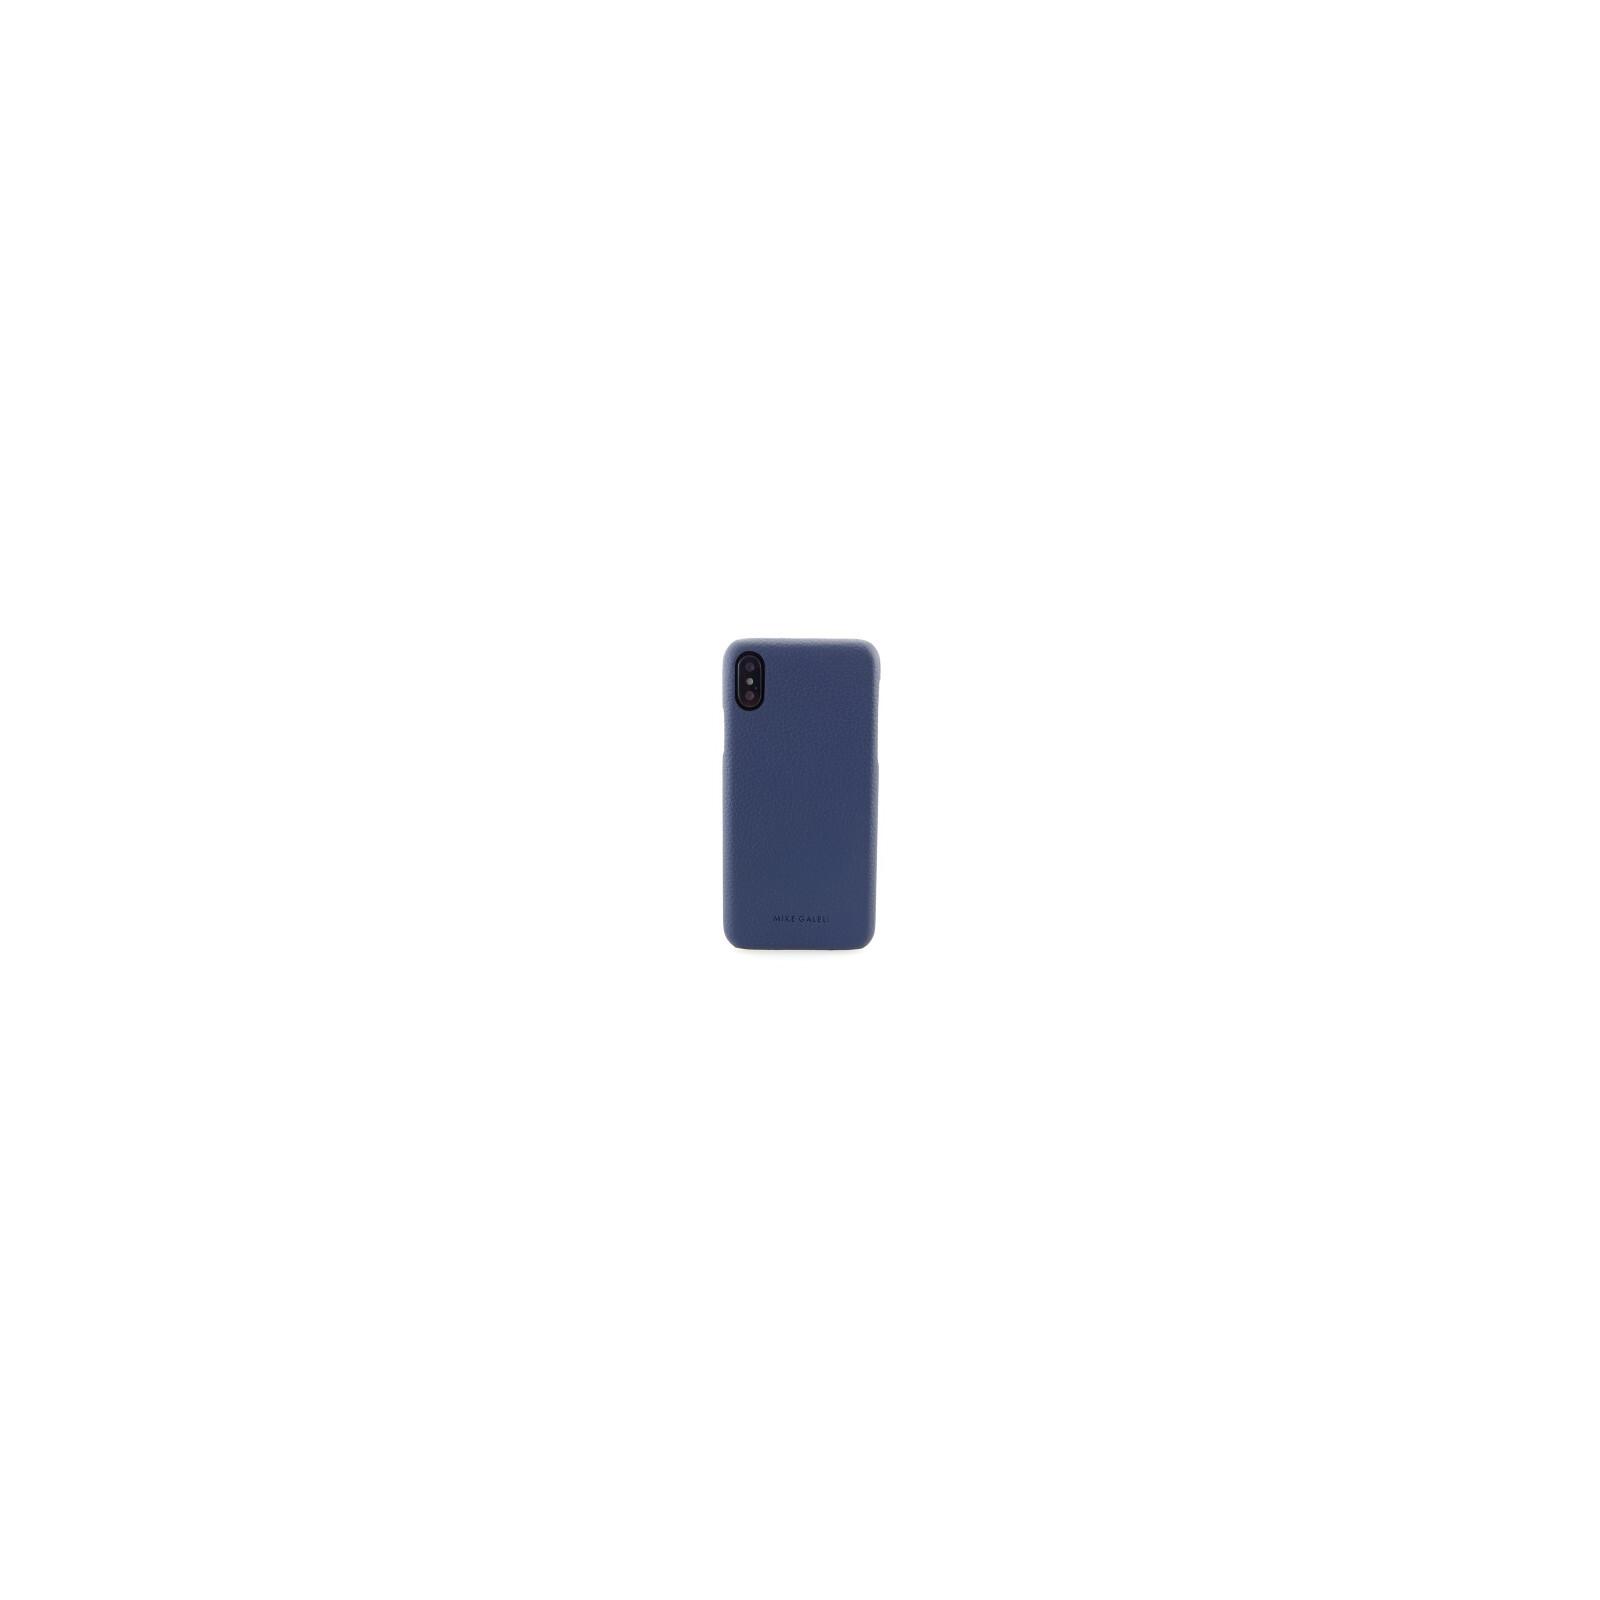 Galeli Back Cover Lenny Apple iPhone XR nachtblau